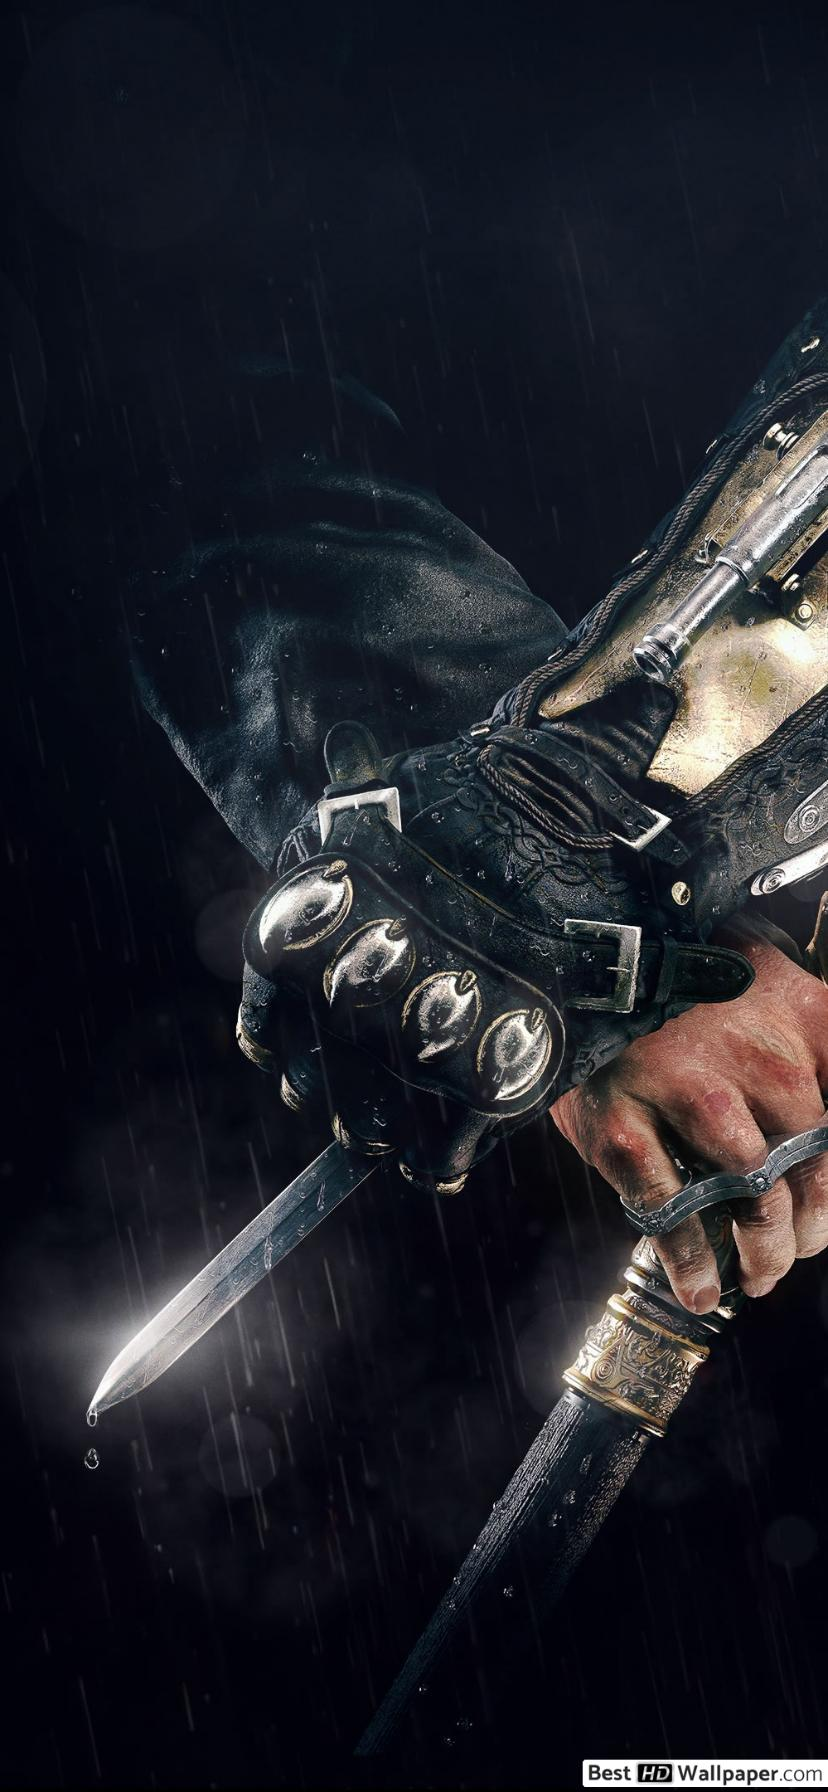 Dark Assassins Creed Mobile Wallpapers - Wallpaper Cave